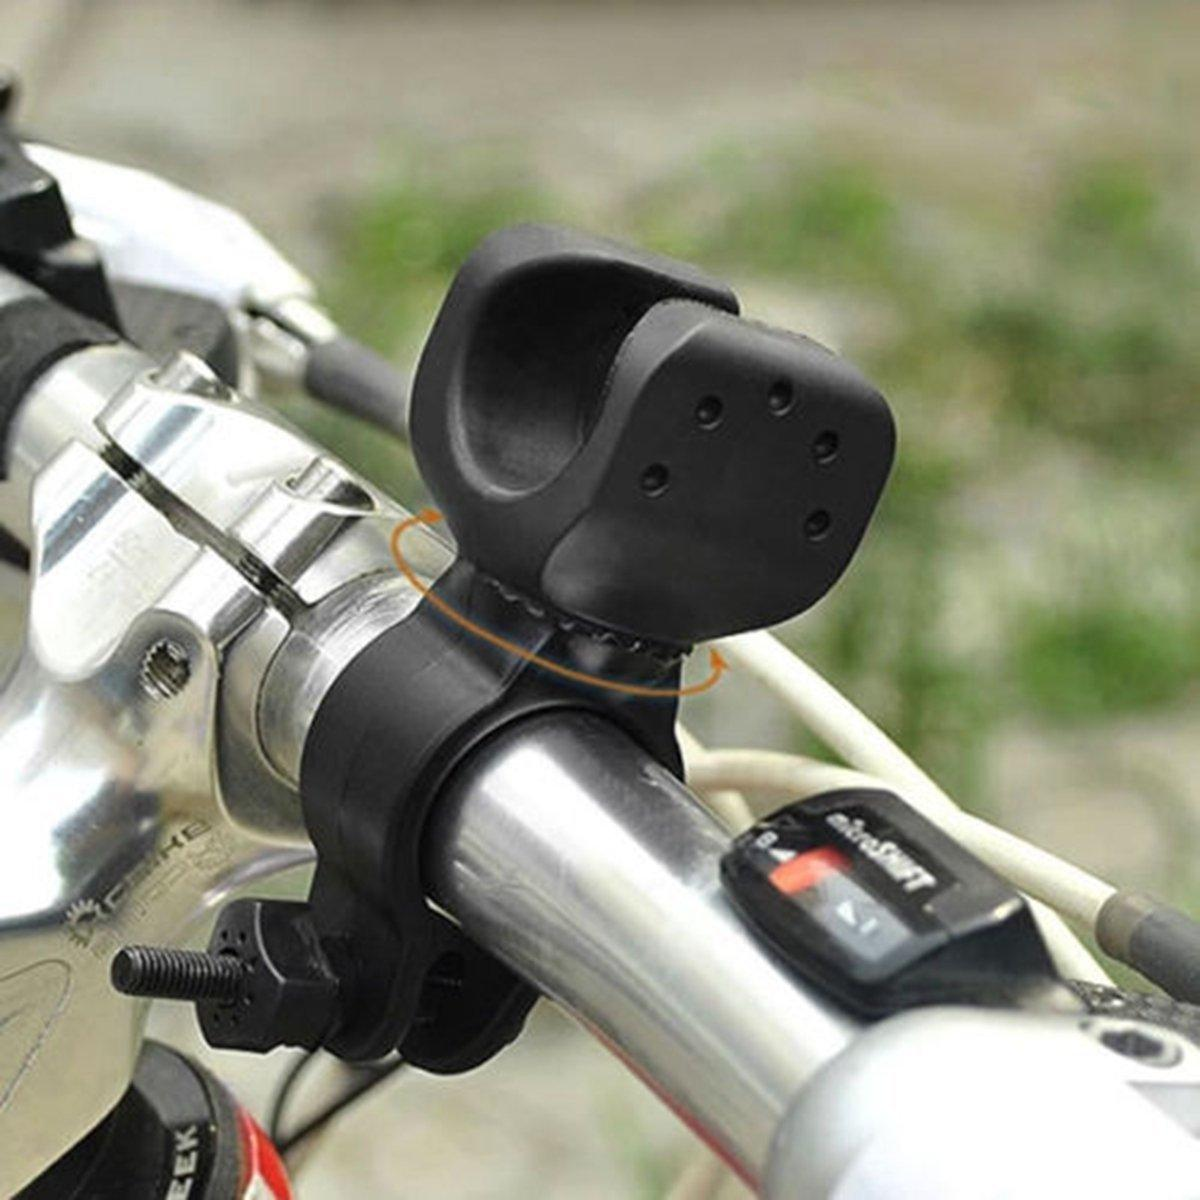 360 Derece Döner Bisiklet Bisiklet Bisiklet LED el feneri Ön Lamba Montaj Tutucu Klip Yüksek Kalite Bike Cycling Işık Aksesuarları